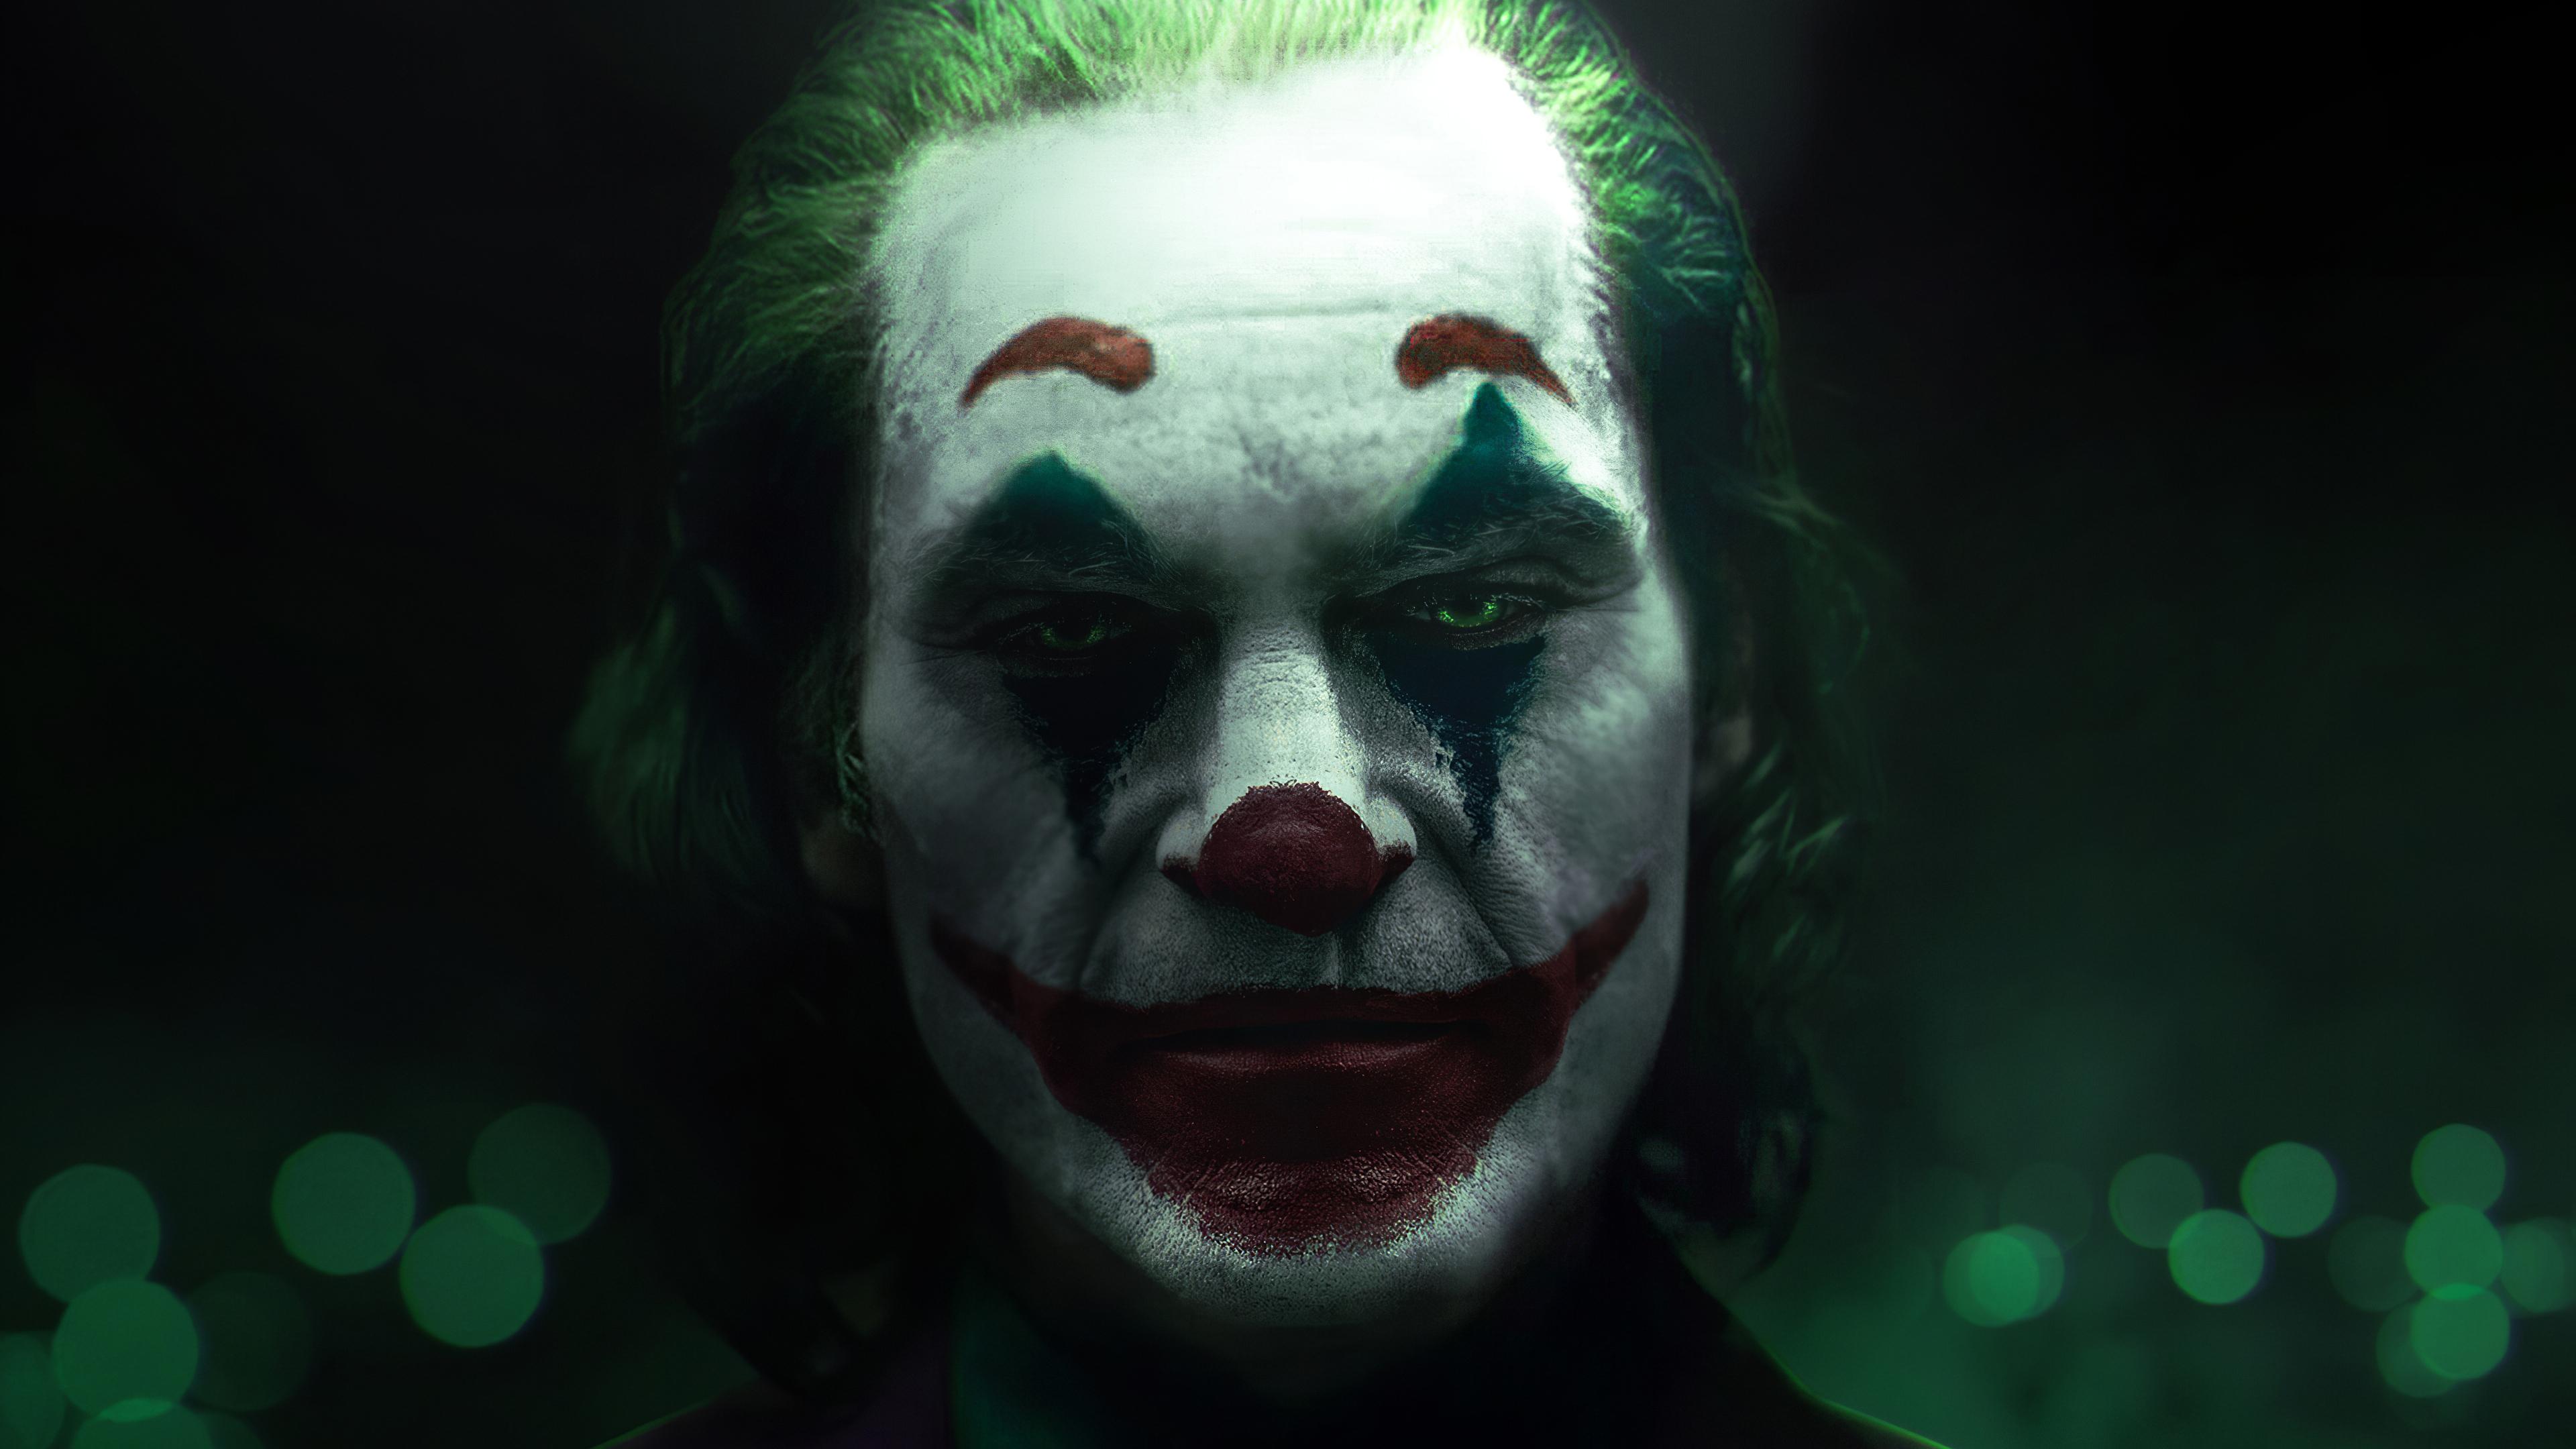 Wallpaper 4k 2020 Joker 4k Wallpaper Joker Joker Background Hd 4k Joker Hd Wallpaper 4k Joker Phone Wallpaper 4k Hd Joker Wallpapers